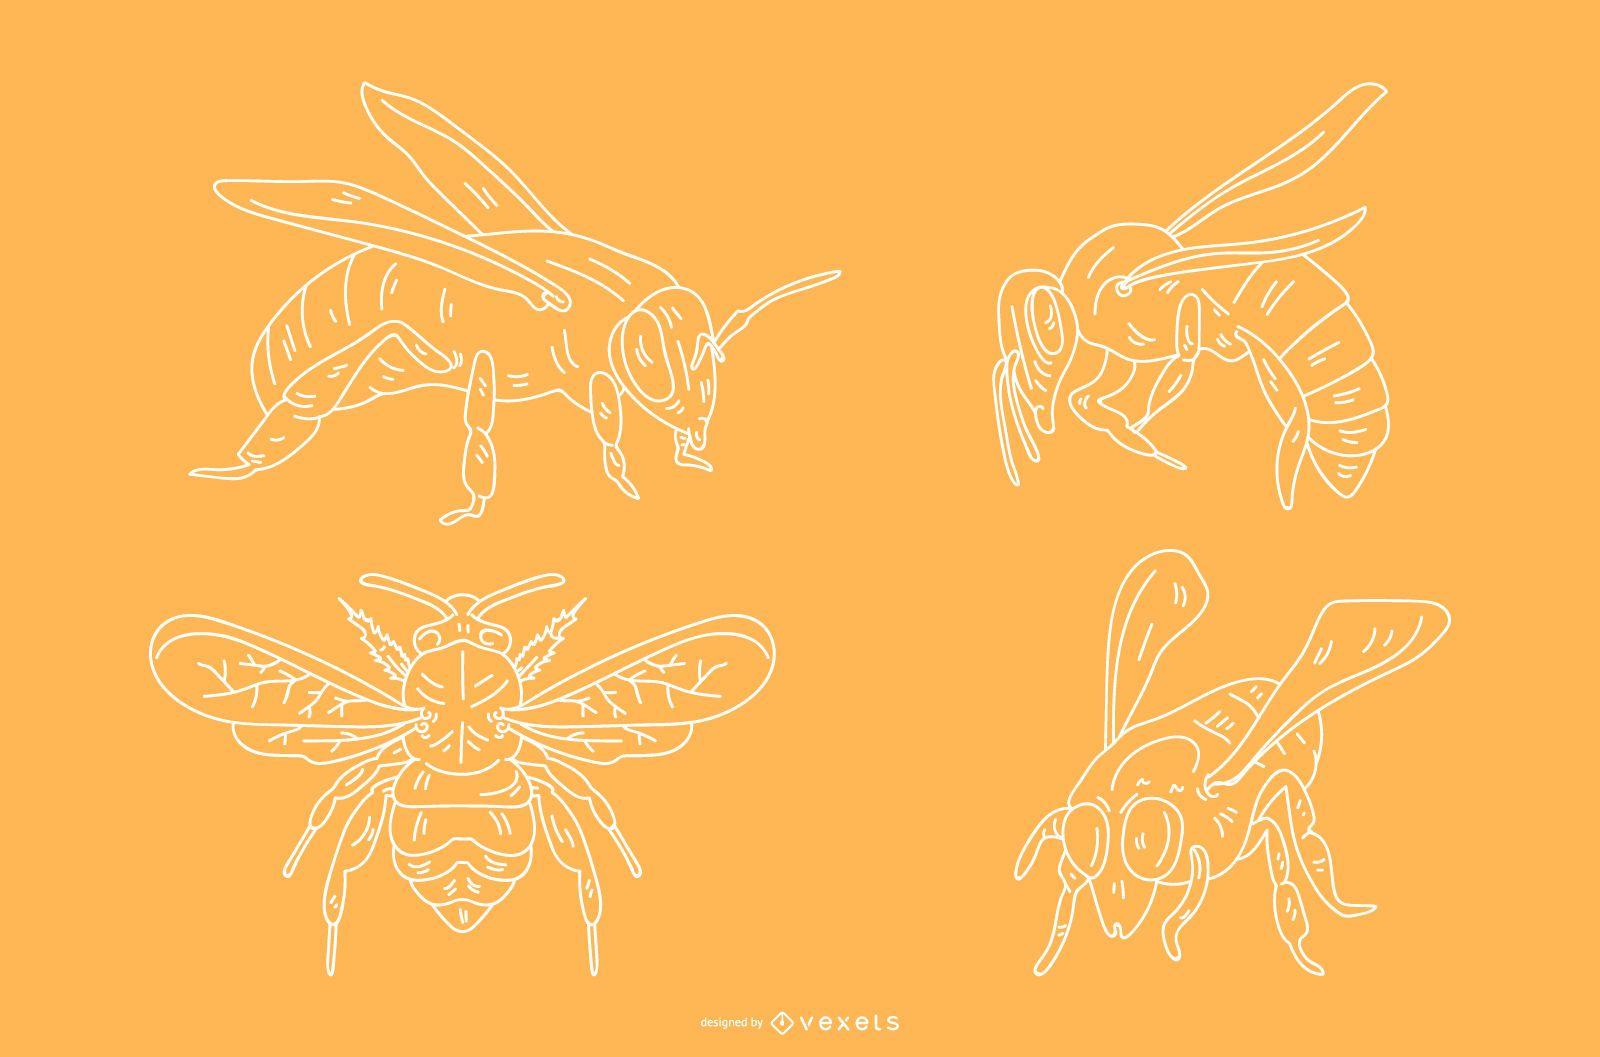 Pencil style bee designs